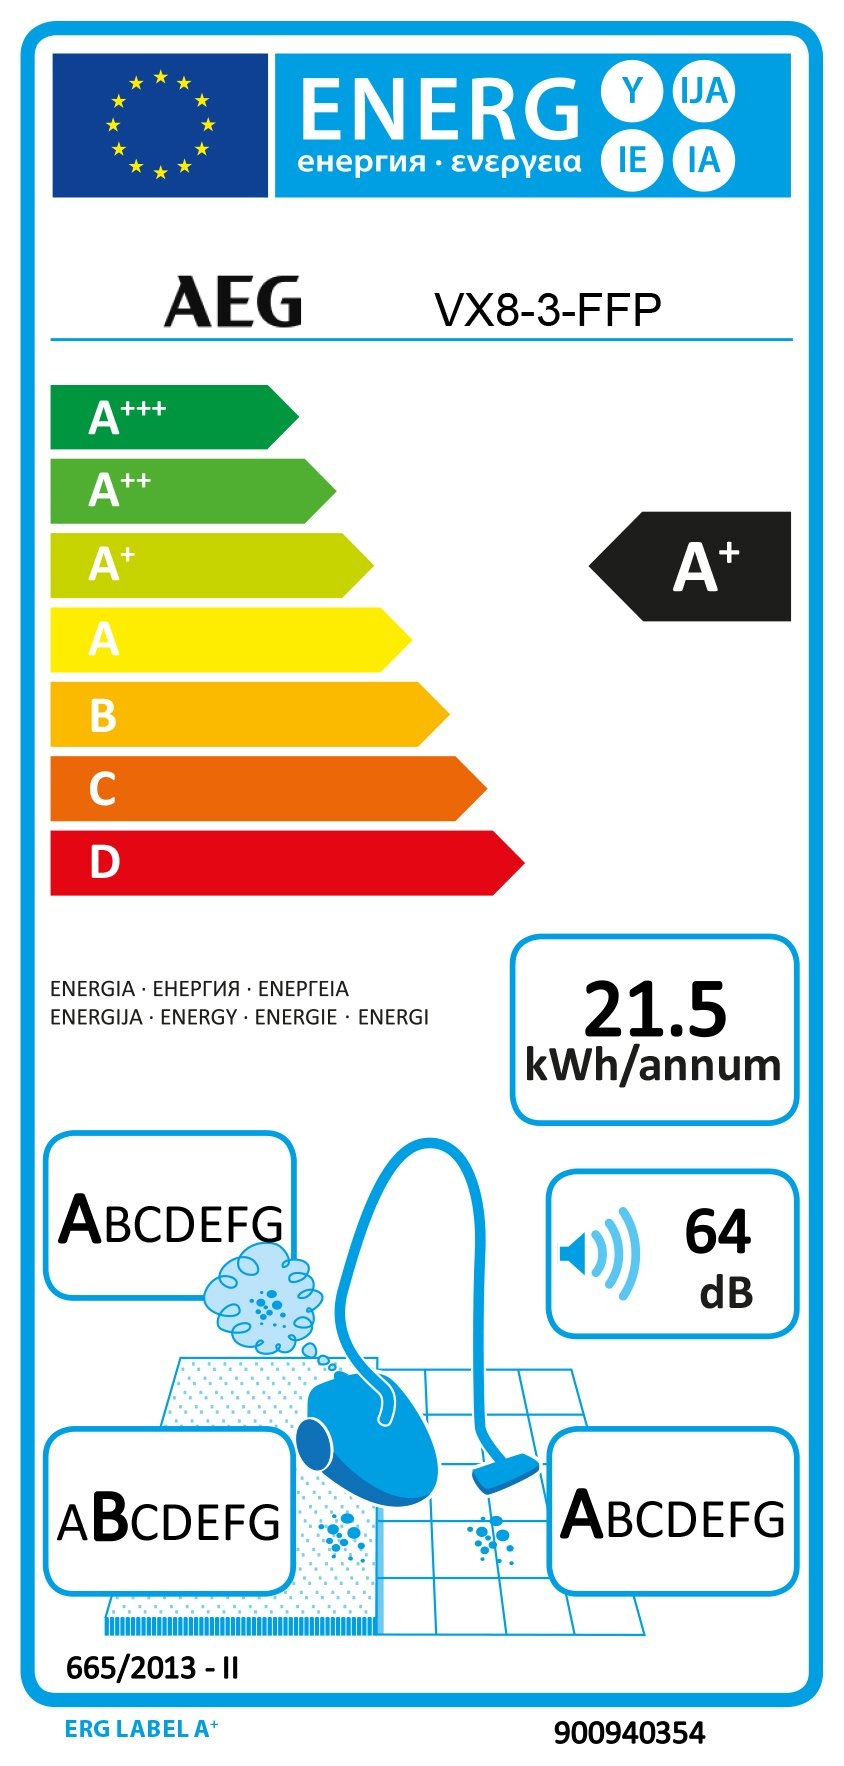 AEG VX8-3-FFP Staubsauger (mit Beutel, 650 W, nur 64 dB(A), 12 m Aktionsradius) blau & AEG GR201SM original s-bag…